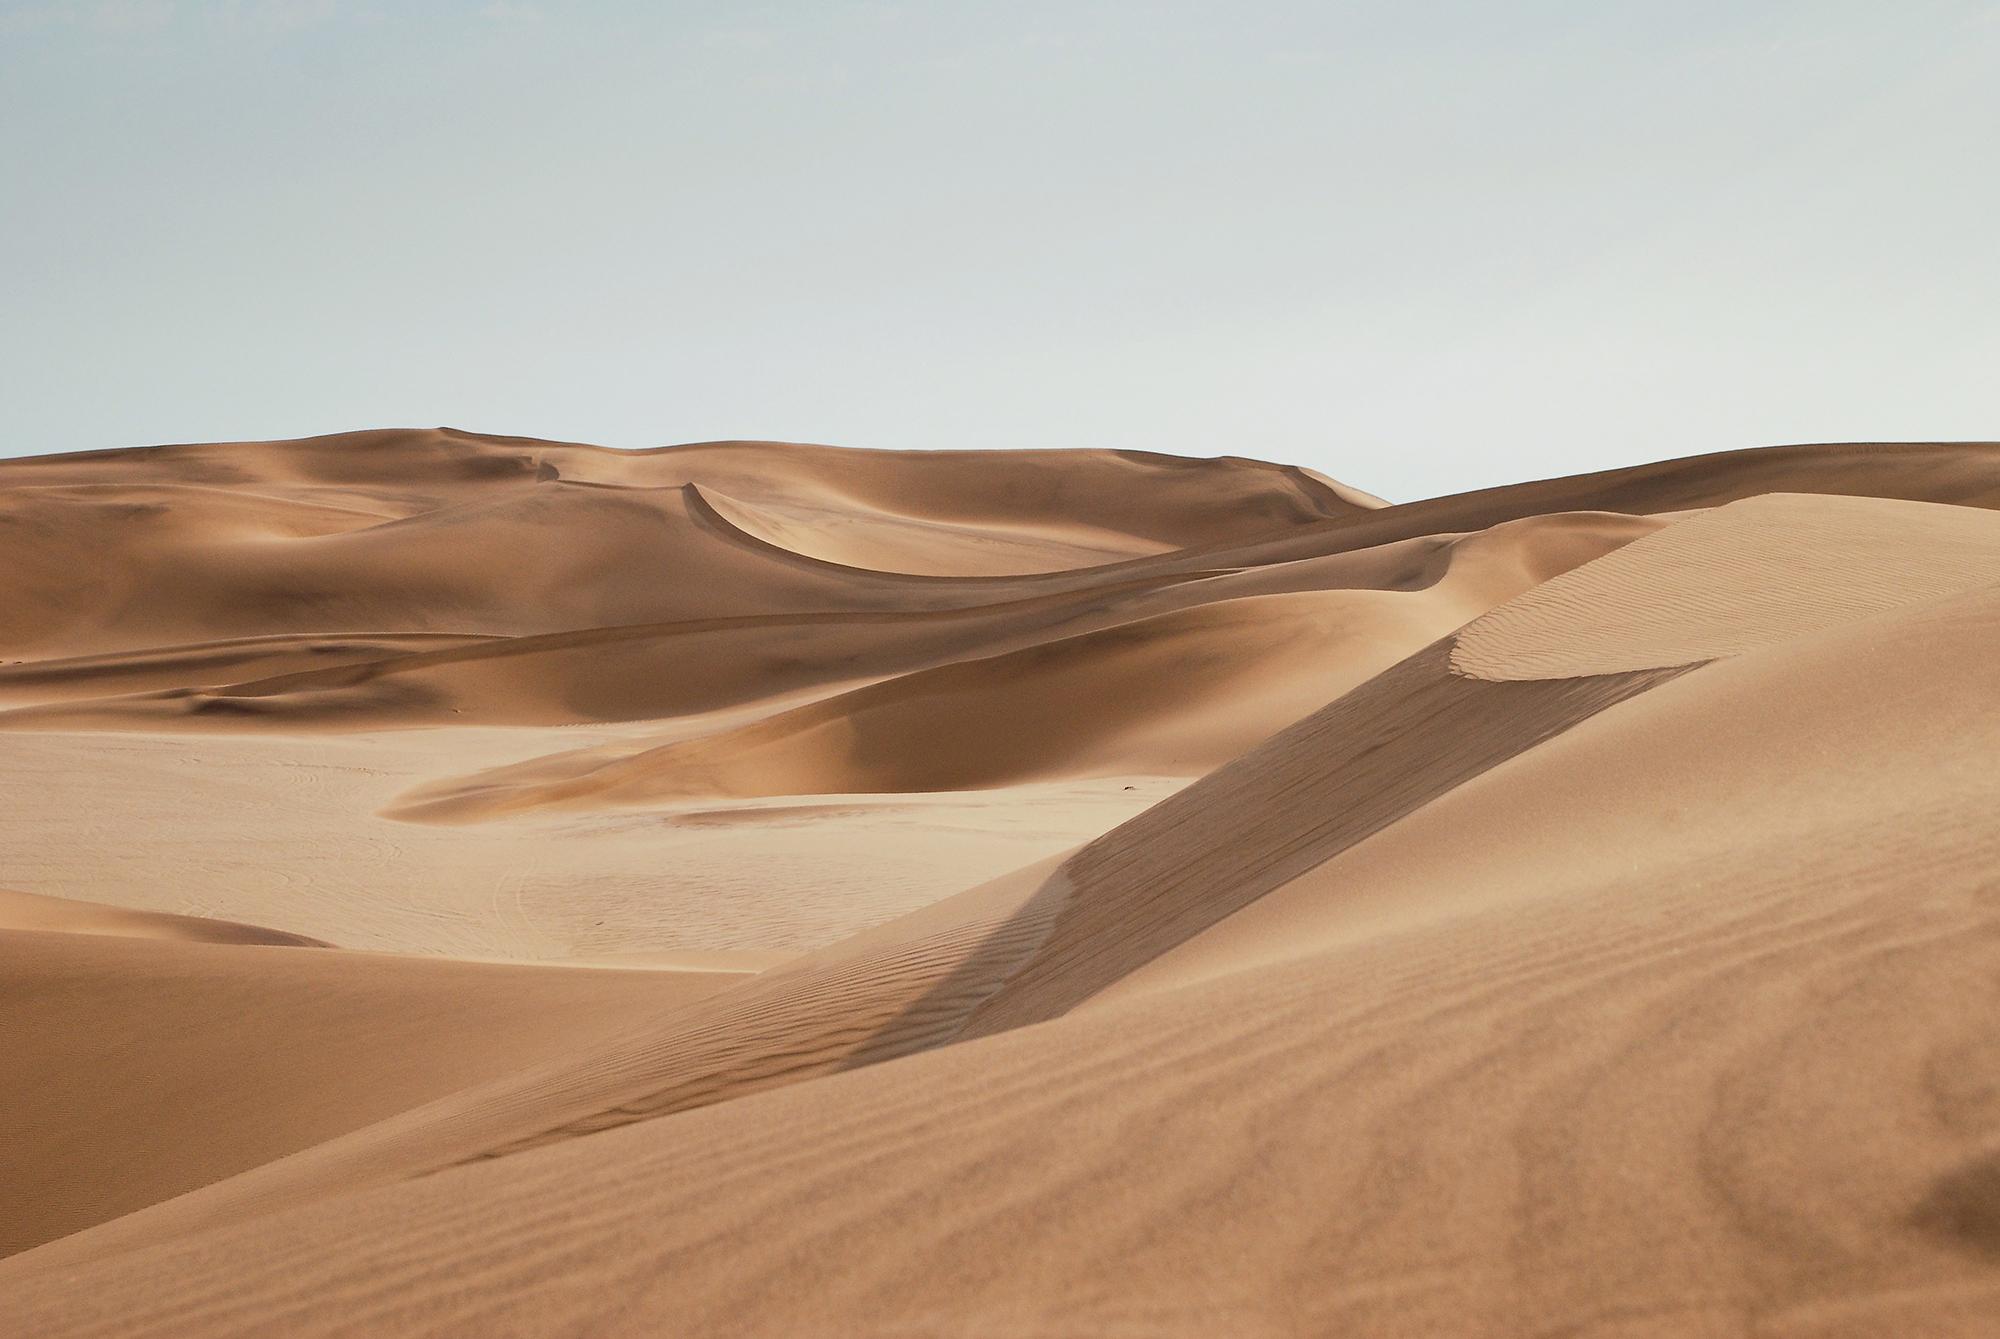 Mad Max - Namib desert, Namibia